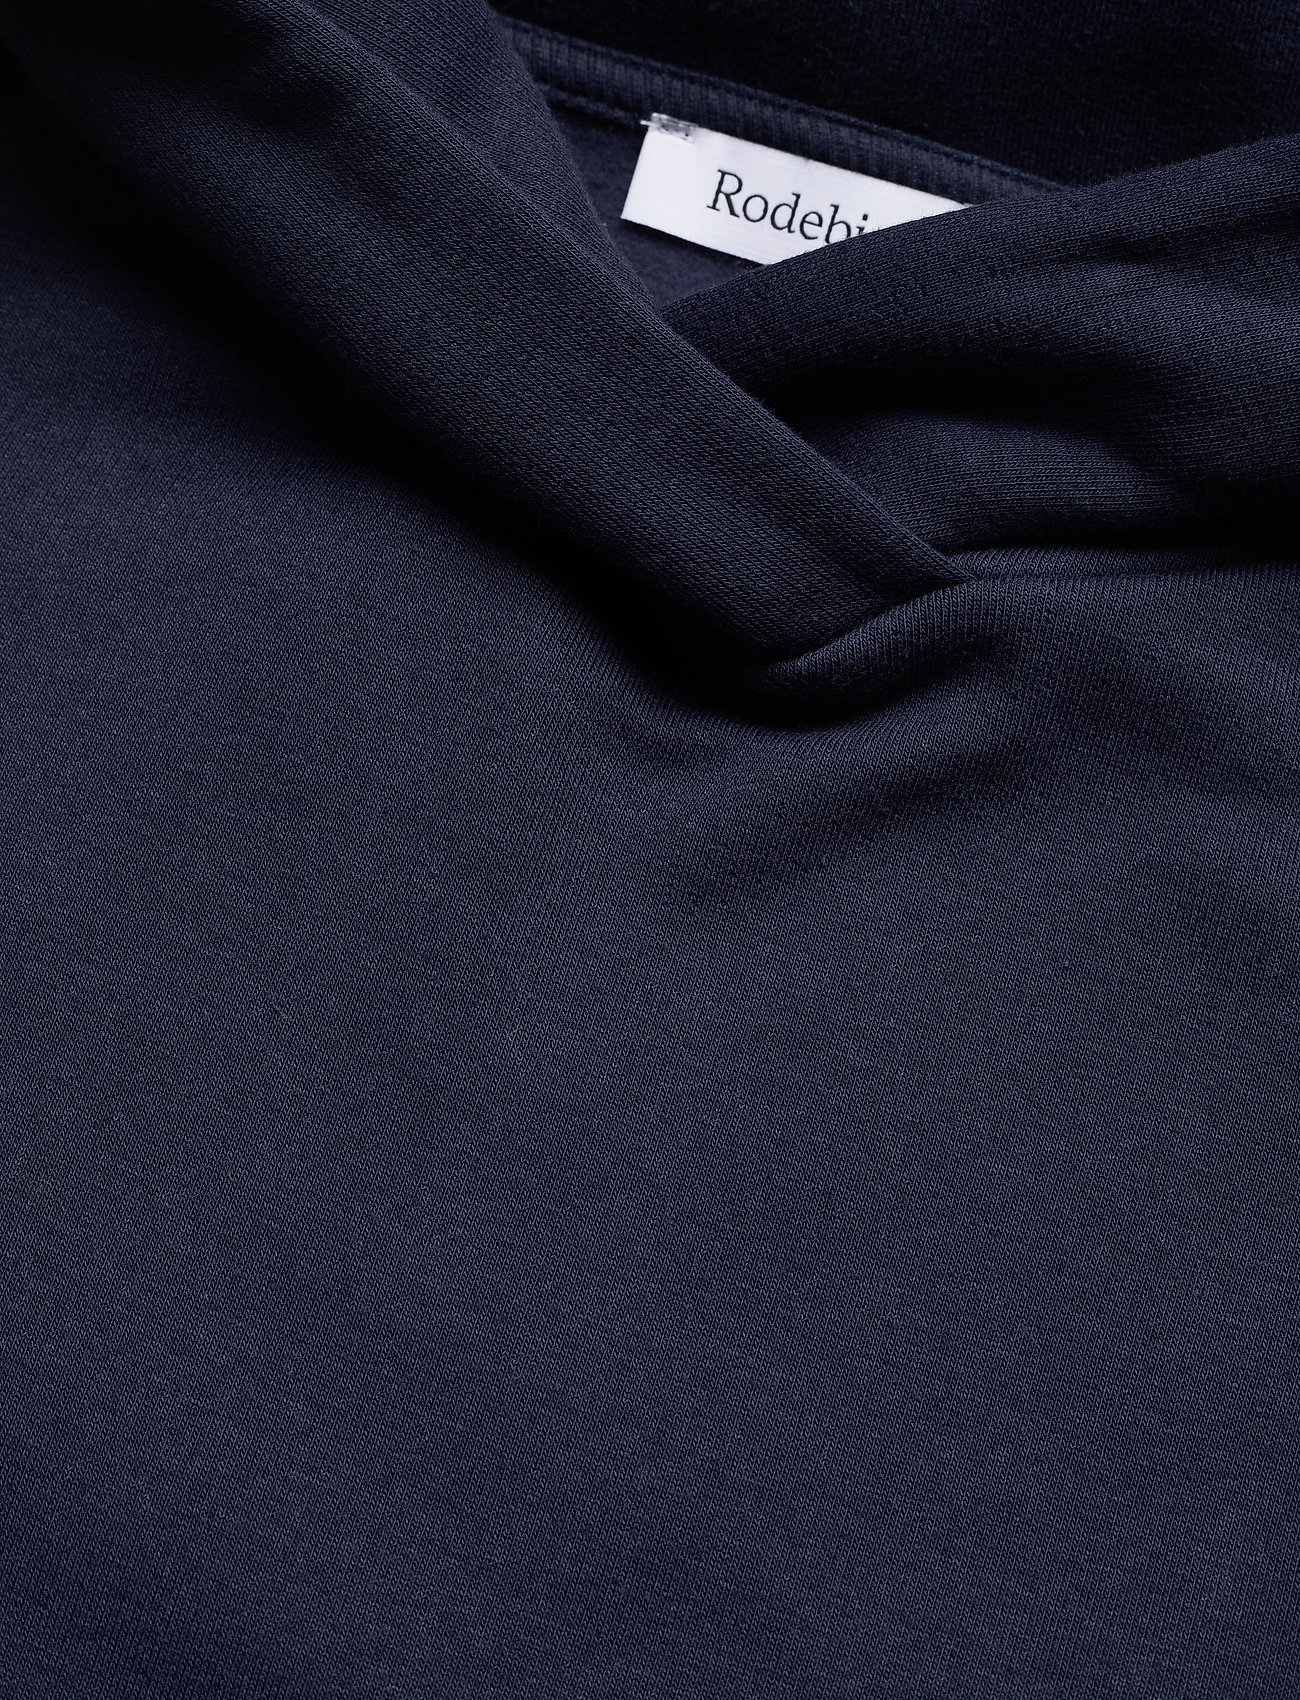 RODEBJER - RODEBJER MARQUESSA - sweatshirts & hættetrøjer - navy - 2